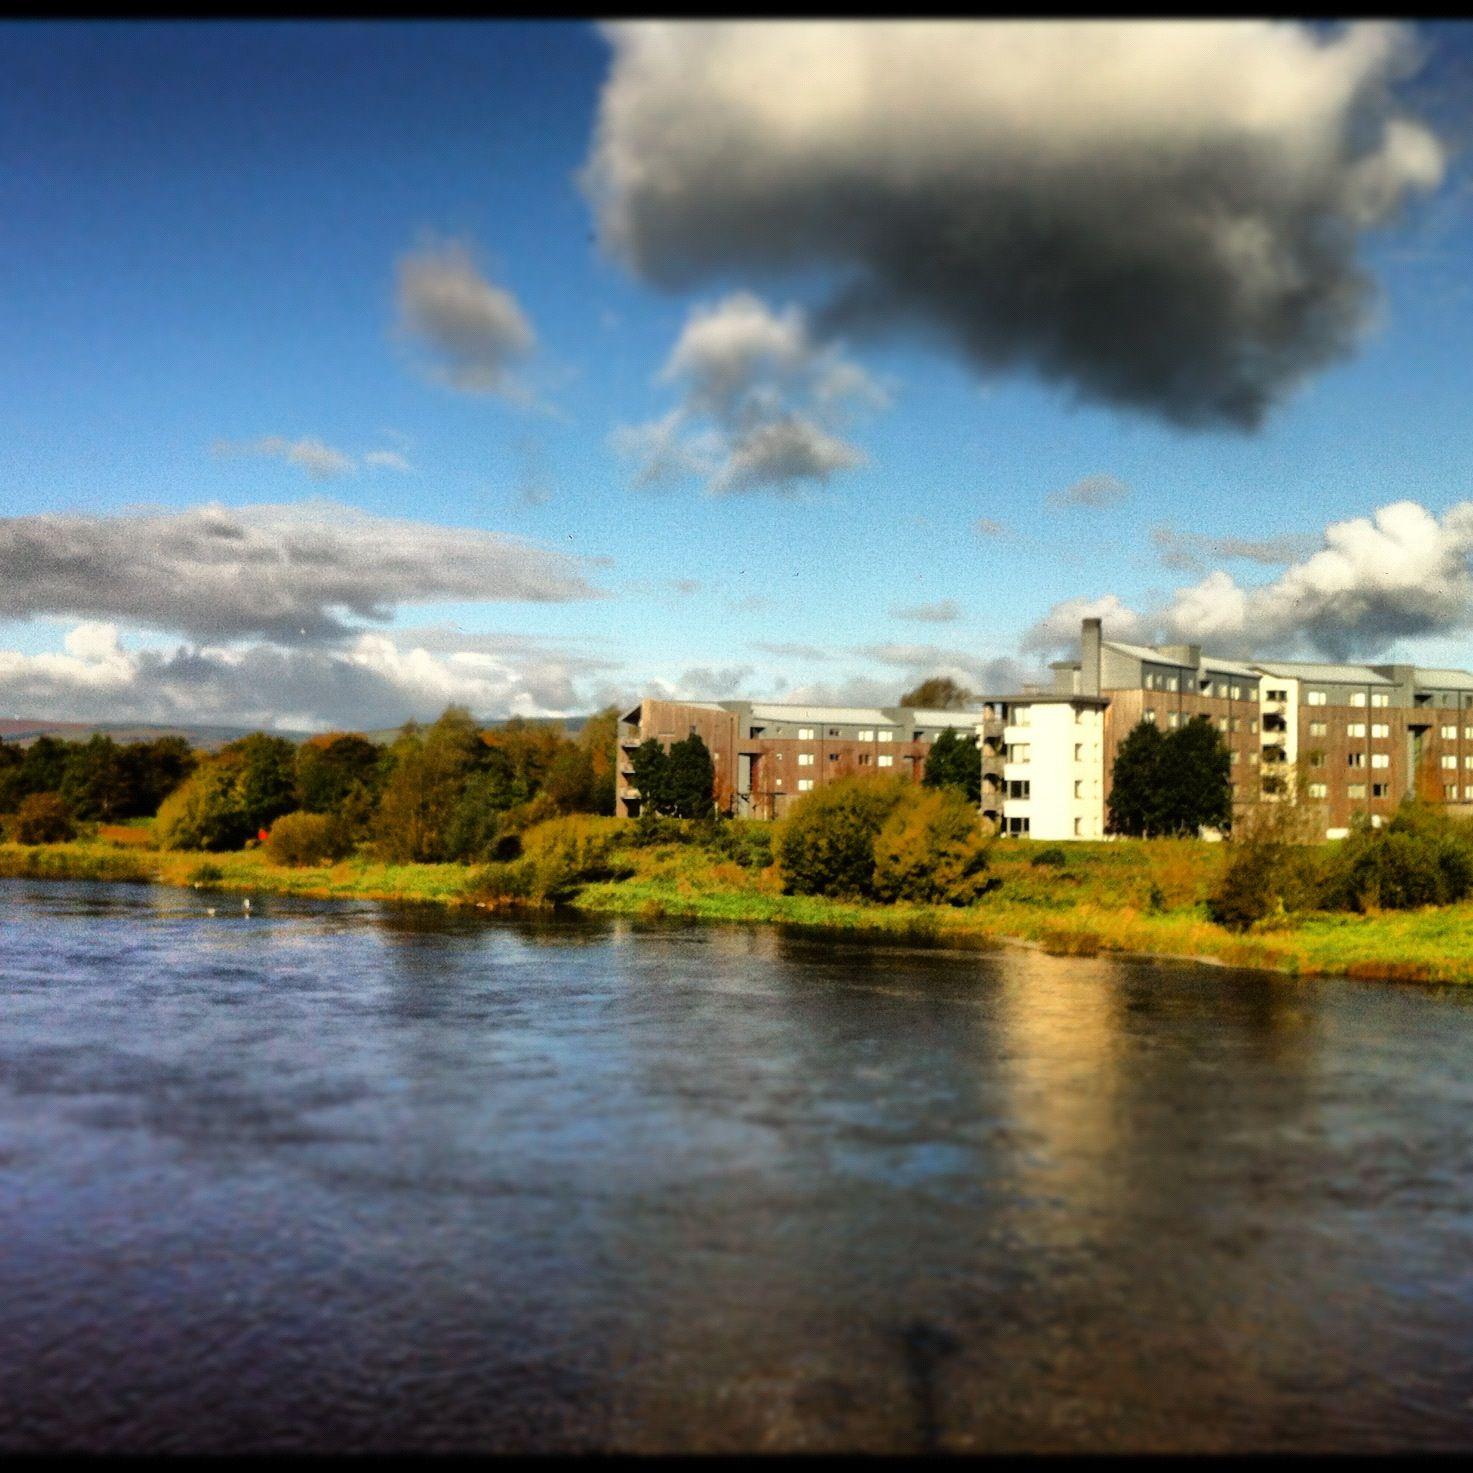 University of Limerick campus